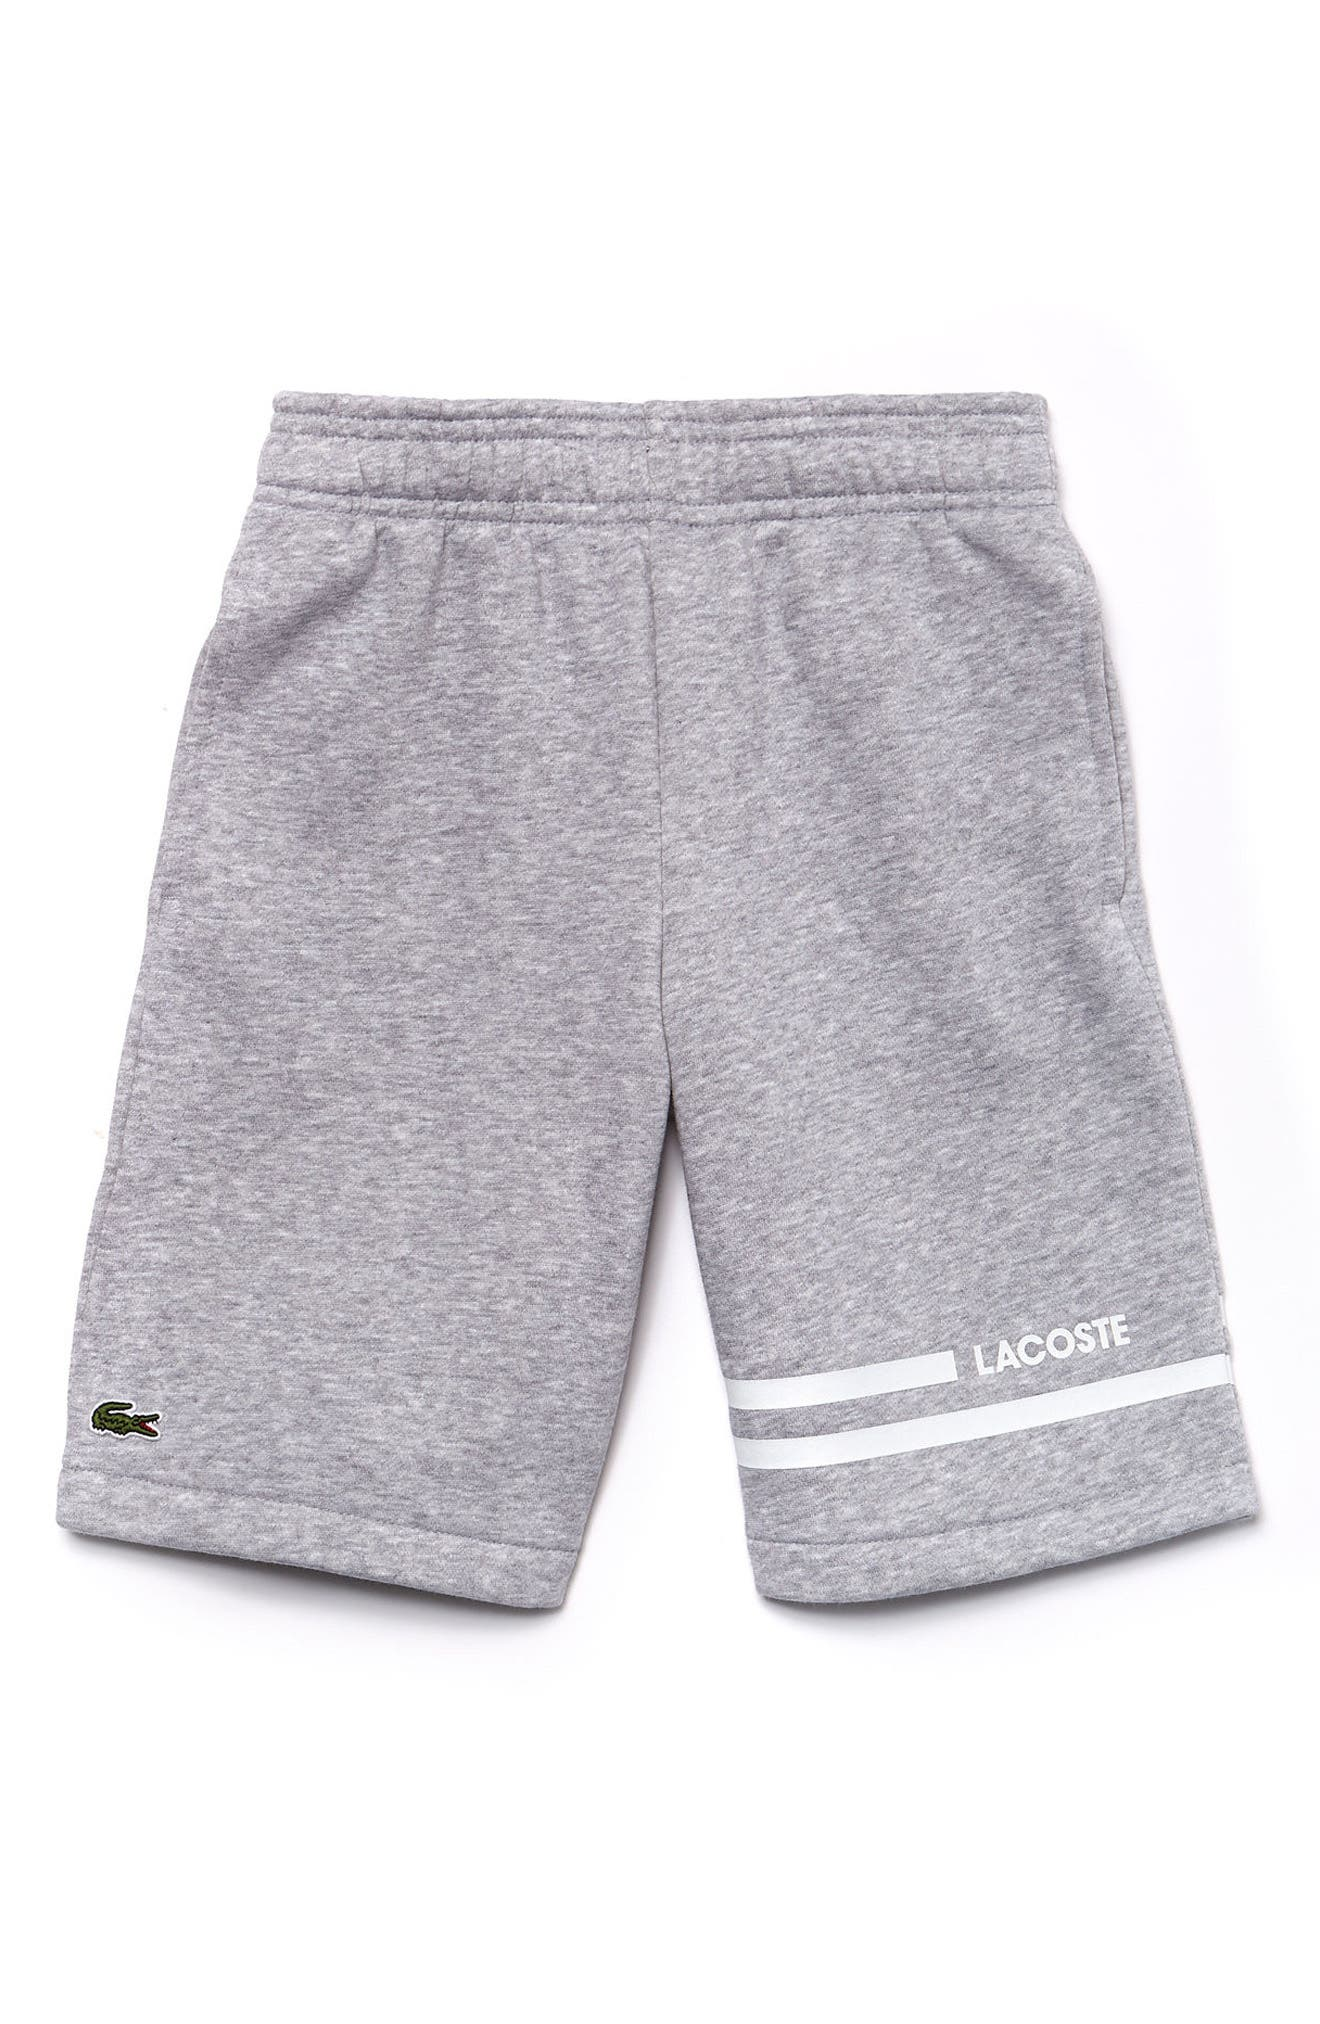 Sport Knit Shorts,                             Main thumbnail 1, color,                             Silver Chine/ White